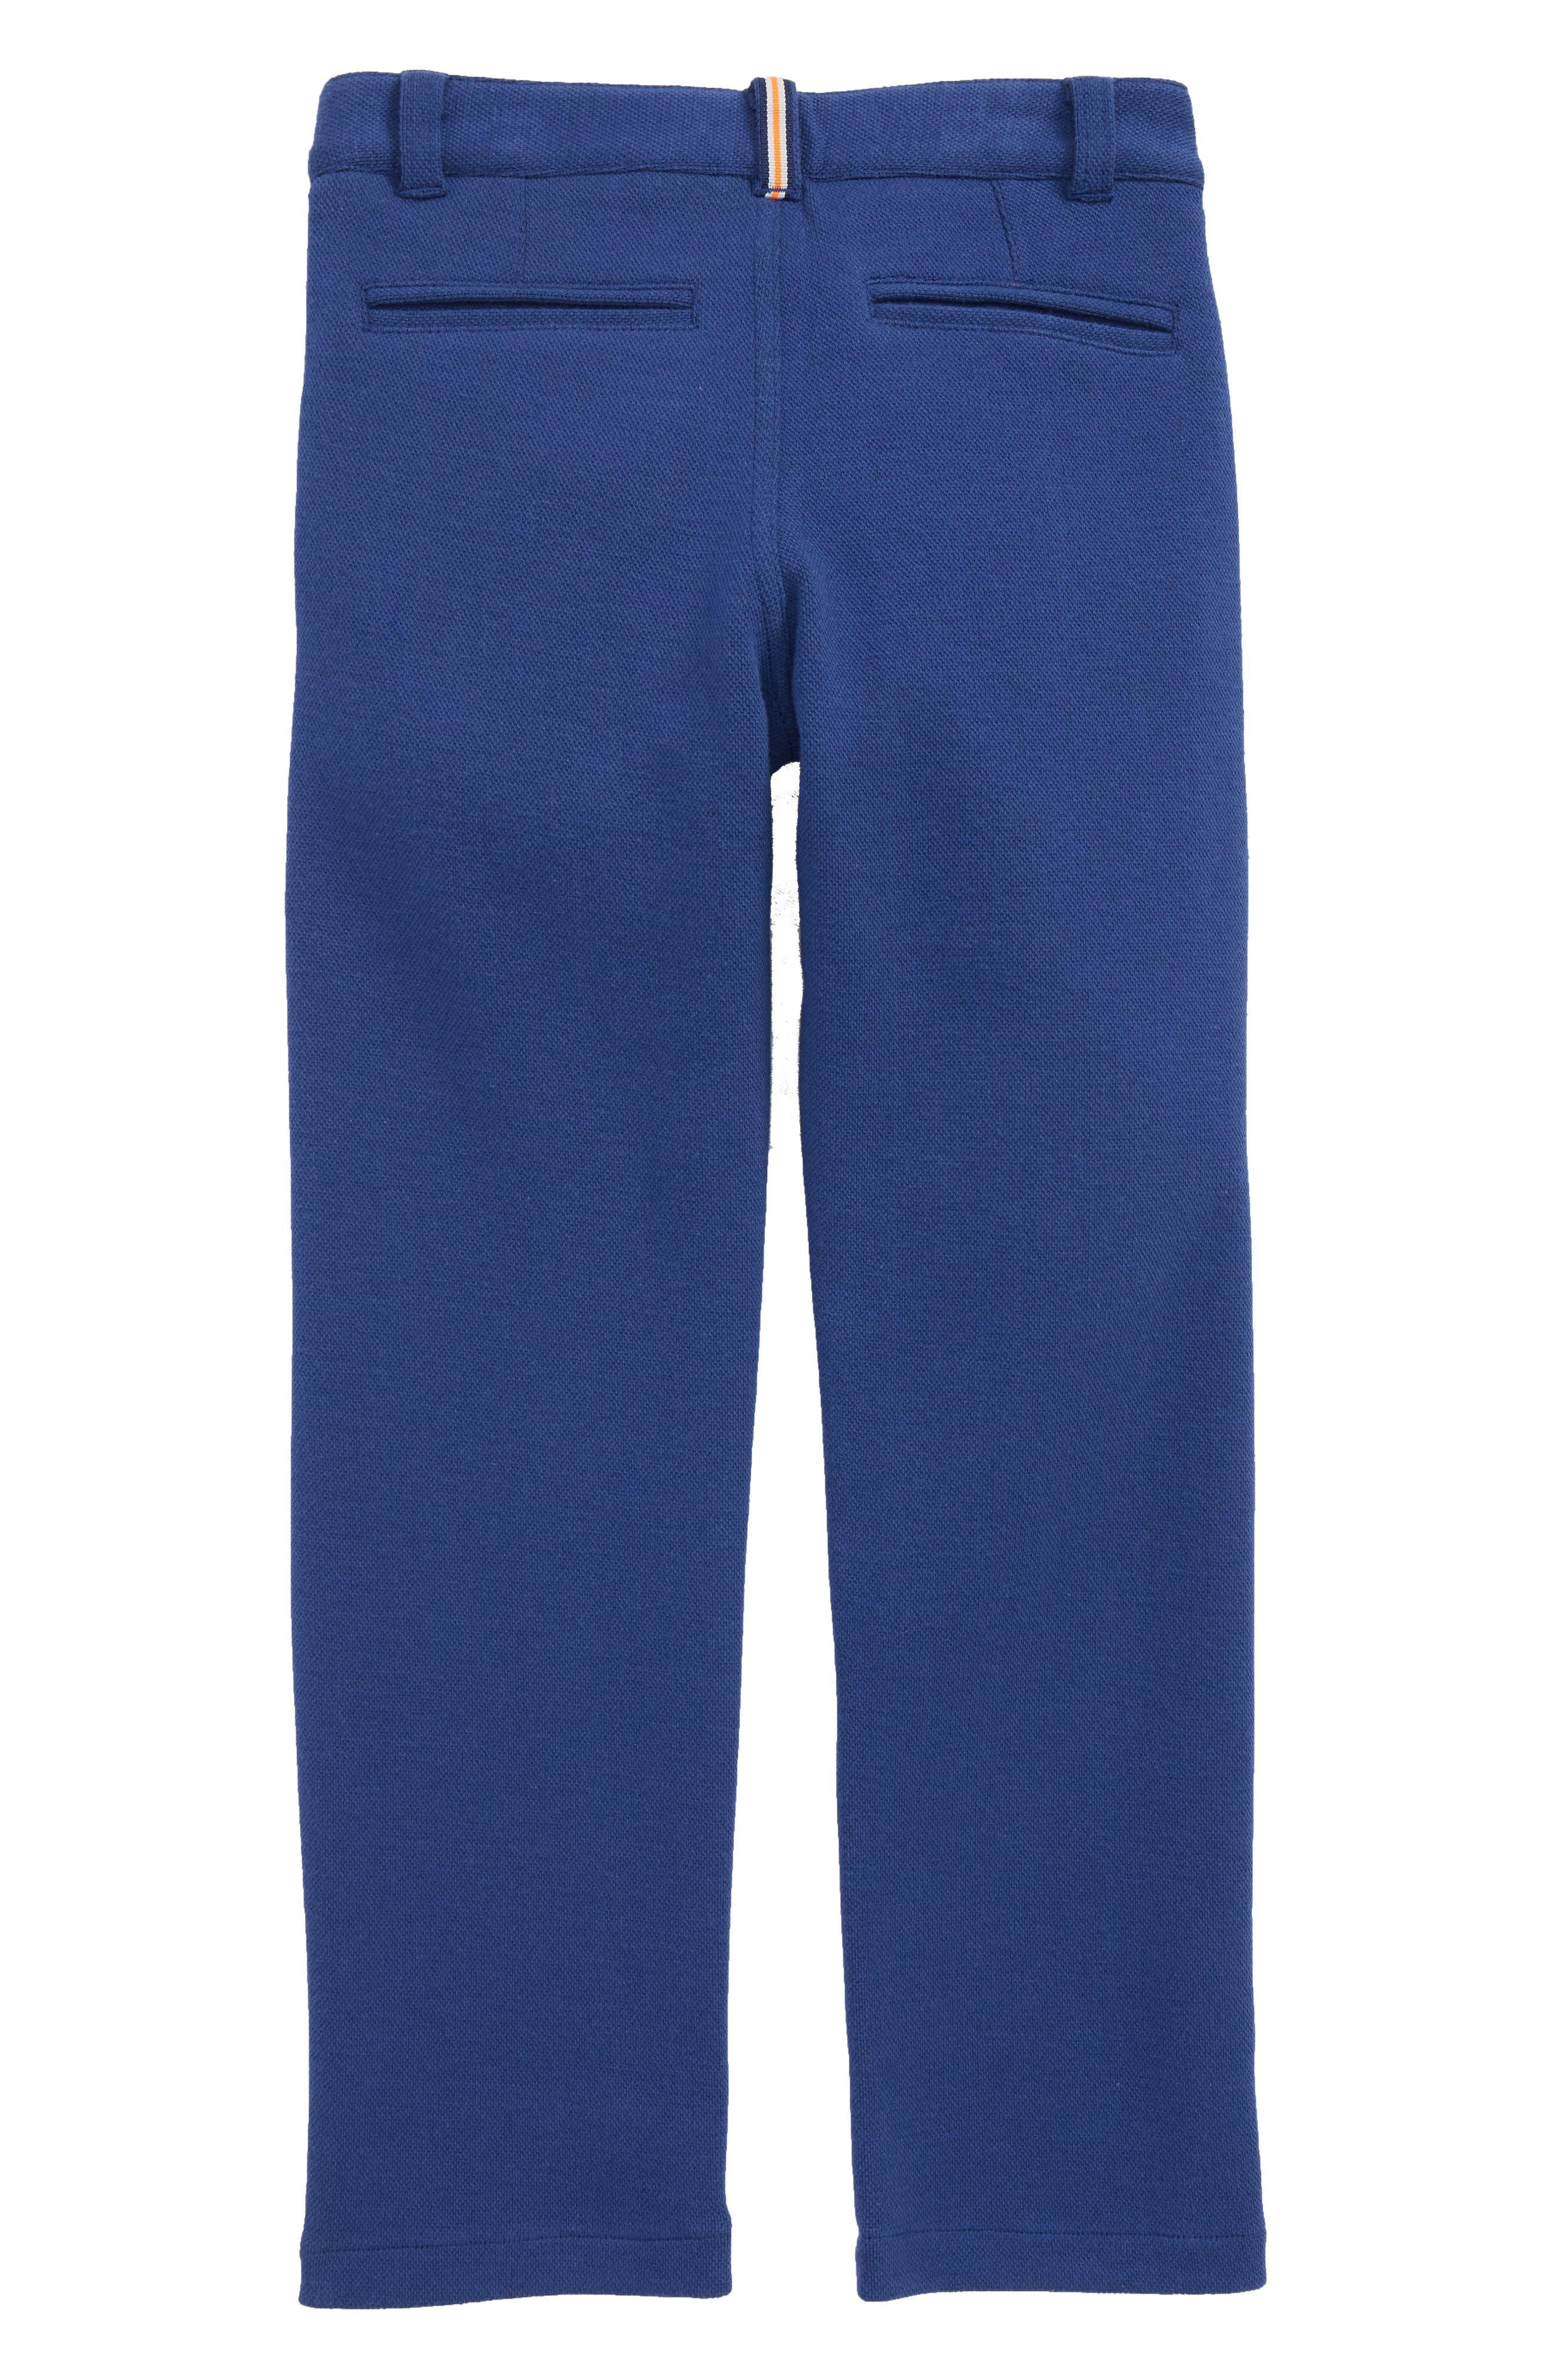 Alternate Image 2  - Mini Boden Jersey Chino Pants (Toddler Boys, Little Boys & Big Boys)